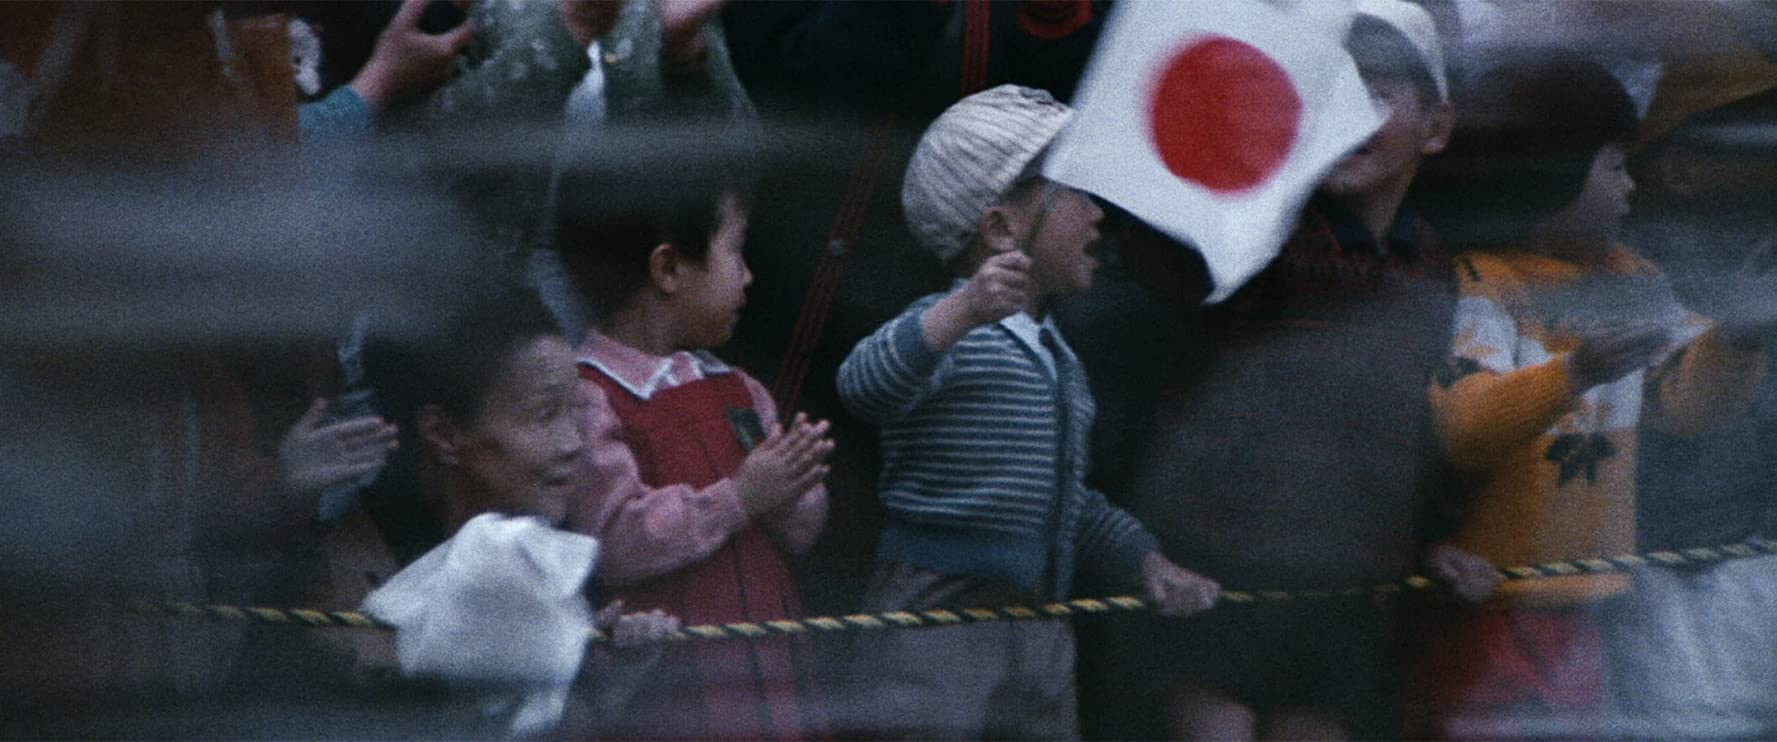 Tokyo Olympiad kids cheering